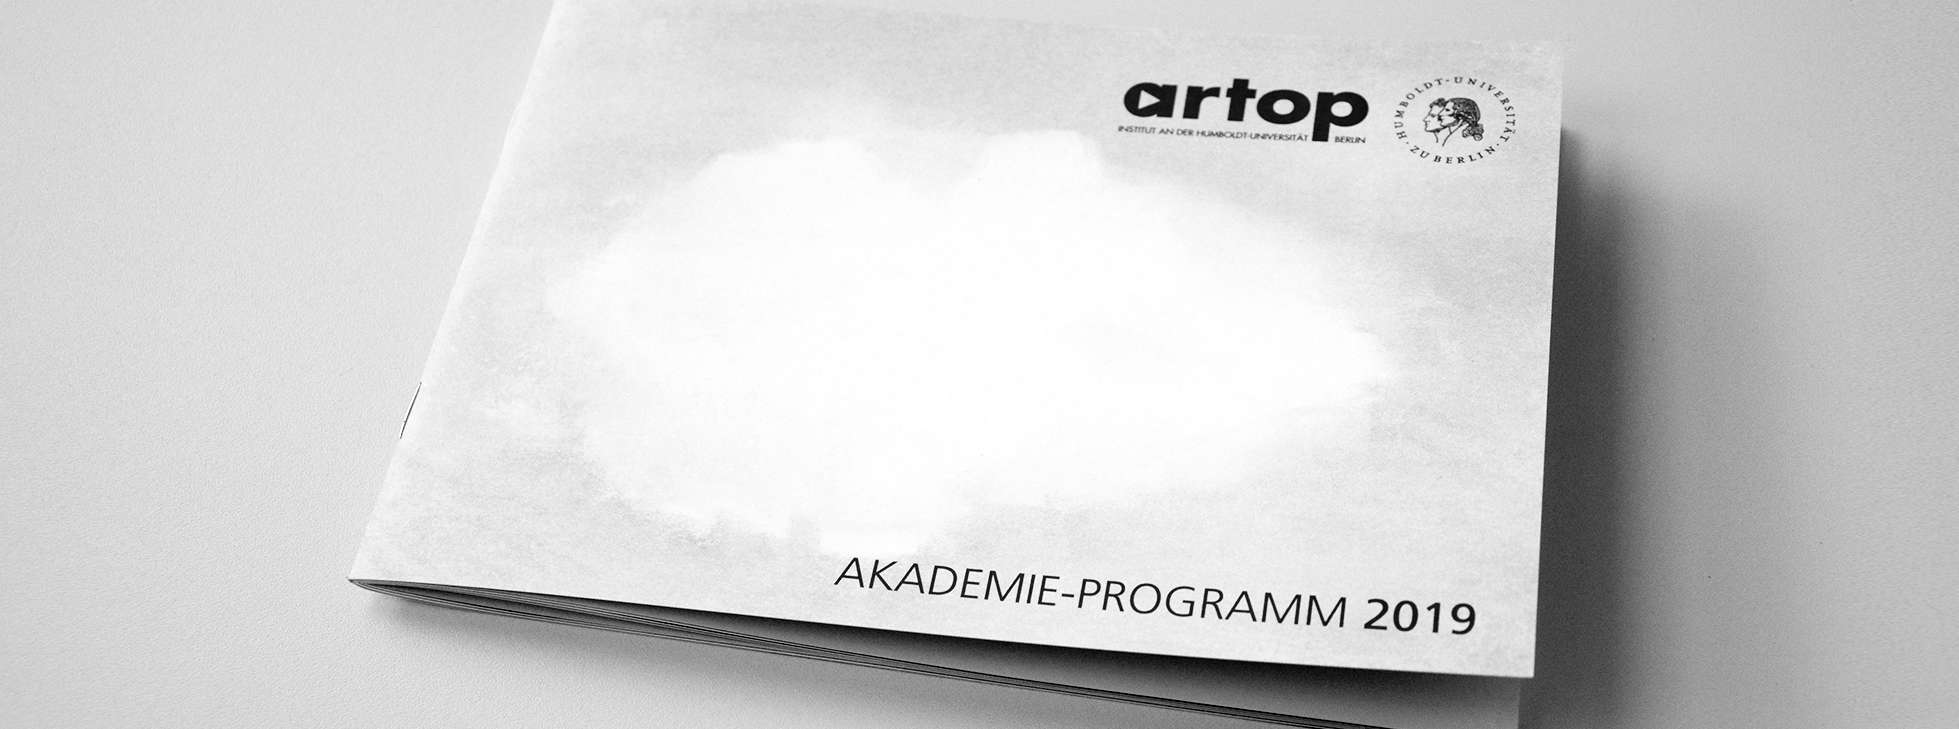 artop Akademie-Programm 2019